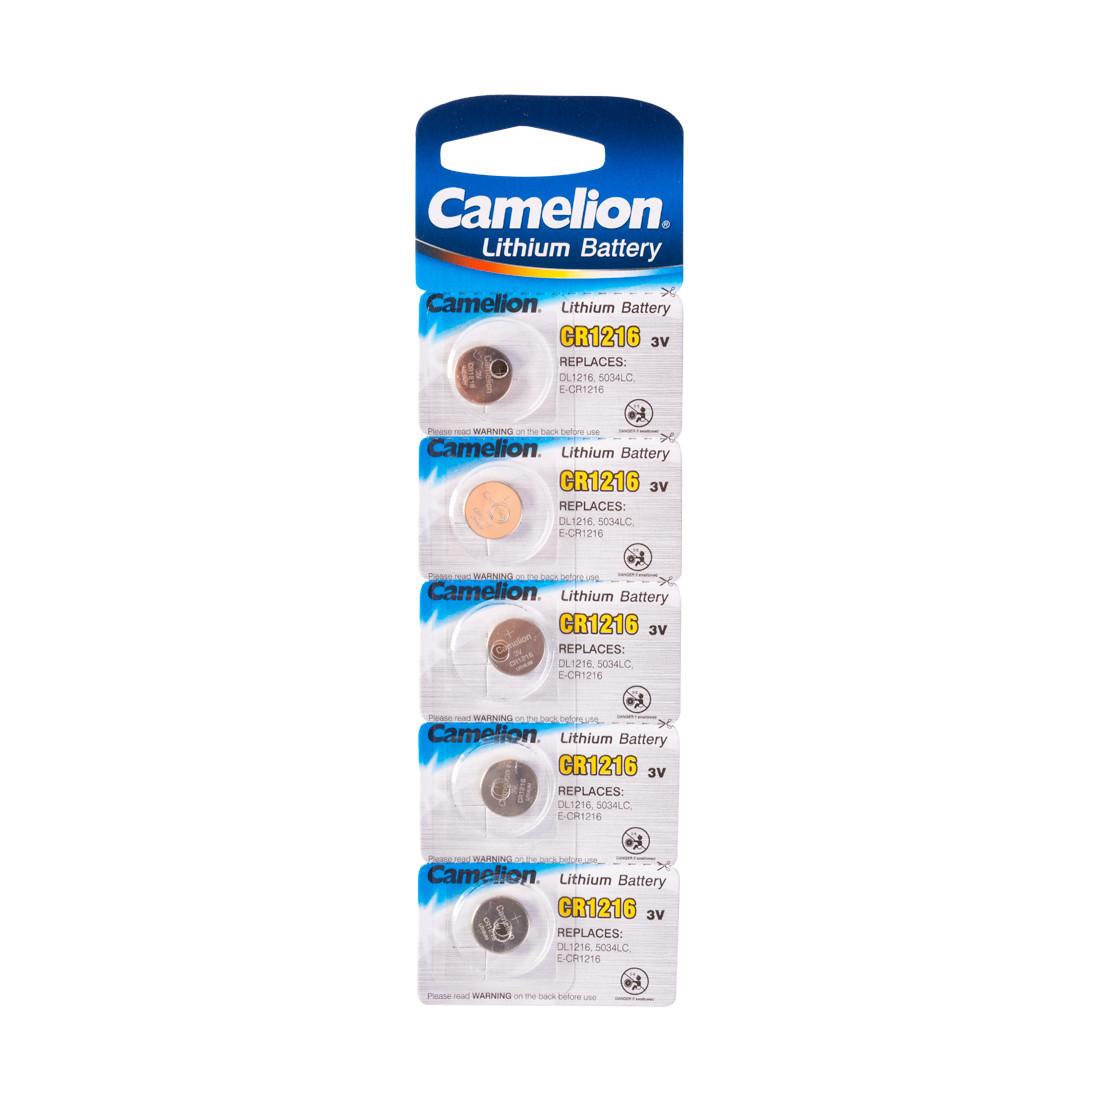 Батарейка Camelion CR1216-BP5 3 В, Упакова: Блистер 1 шт., Аналоги: CR1616\5021LC, Тип батареи: Литий-ионный